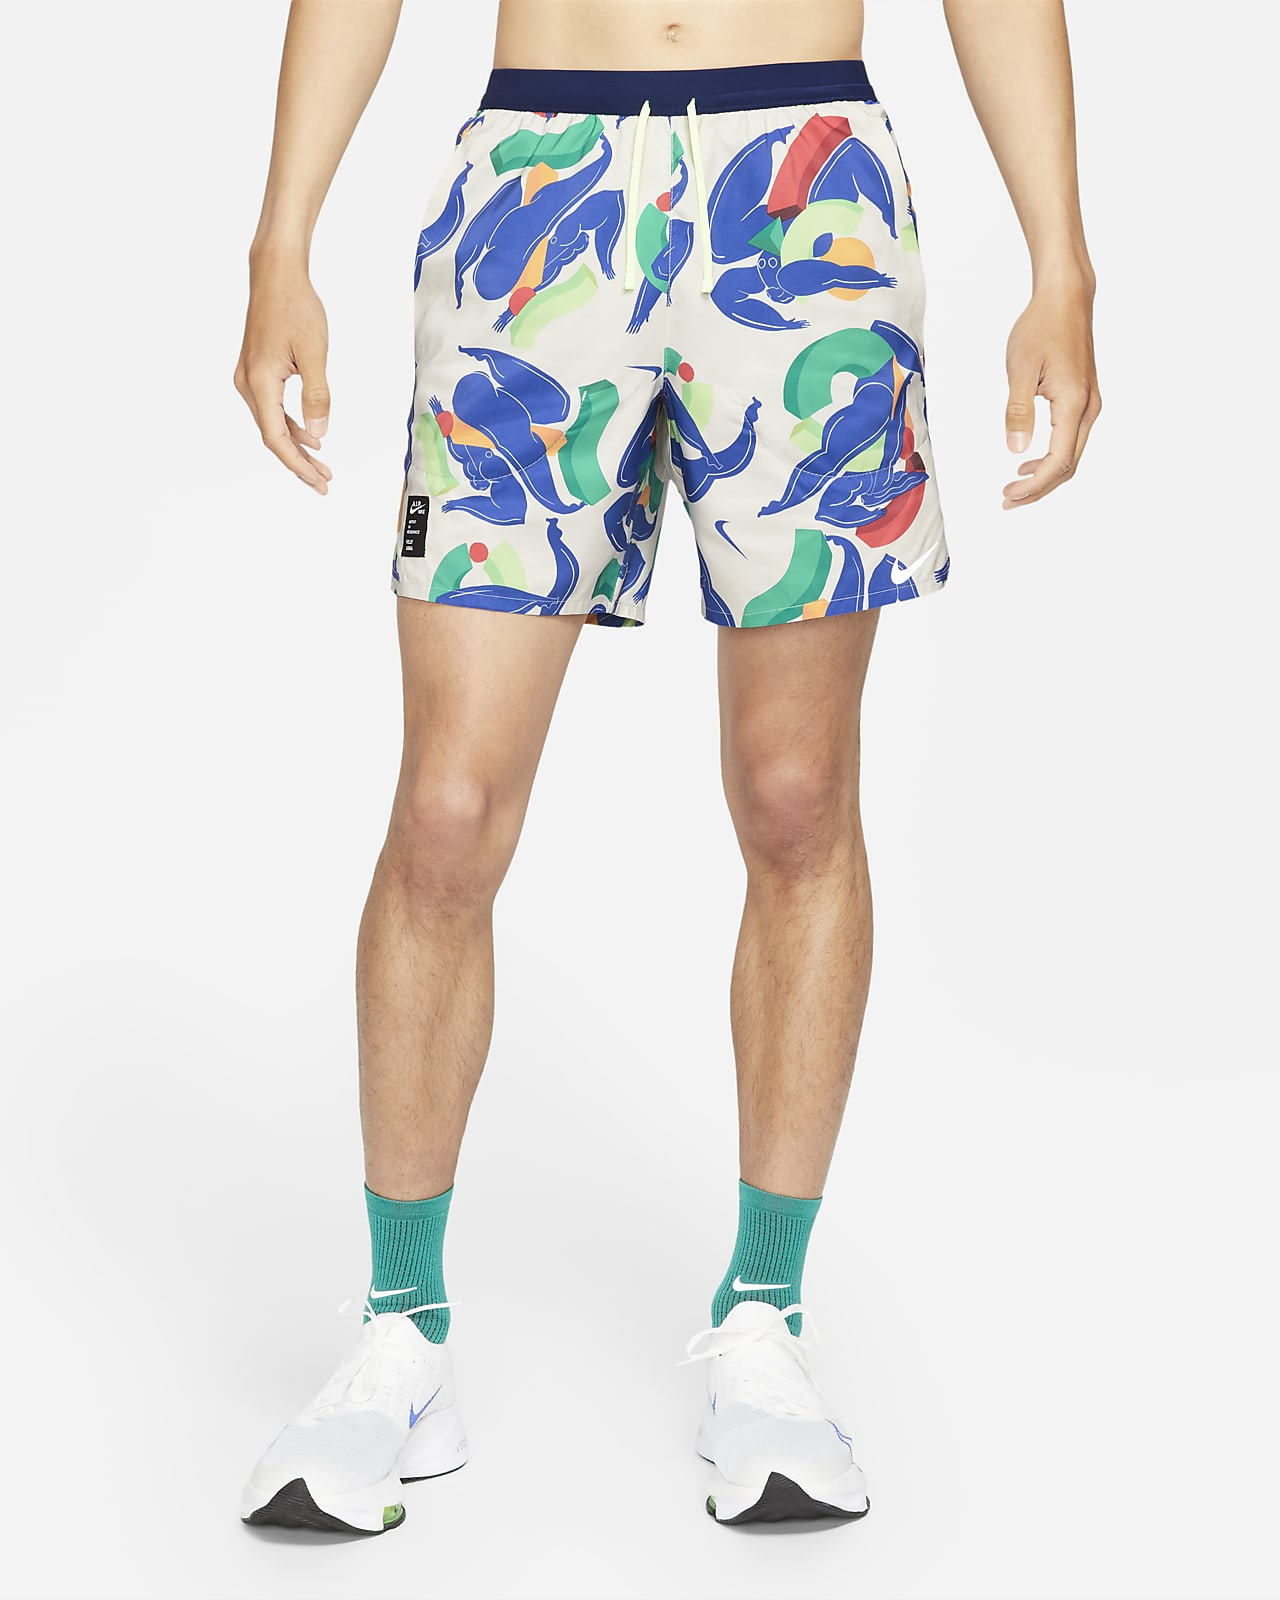 Nike Flex Stride A.I.R.Kelly Anna London Men's 18cm (approx.) Running Shorts